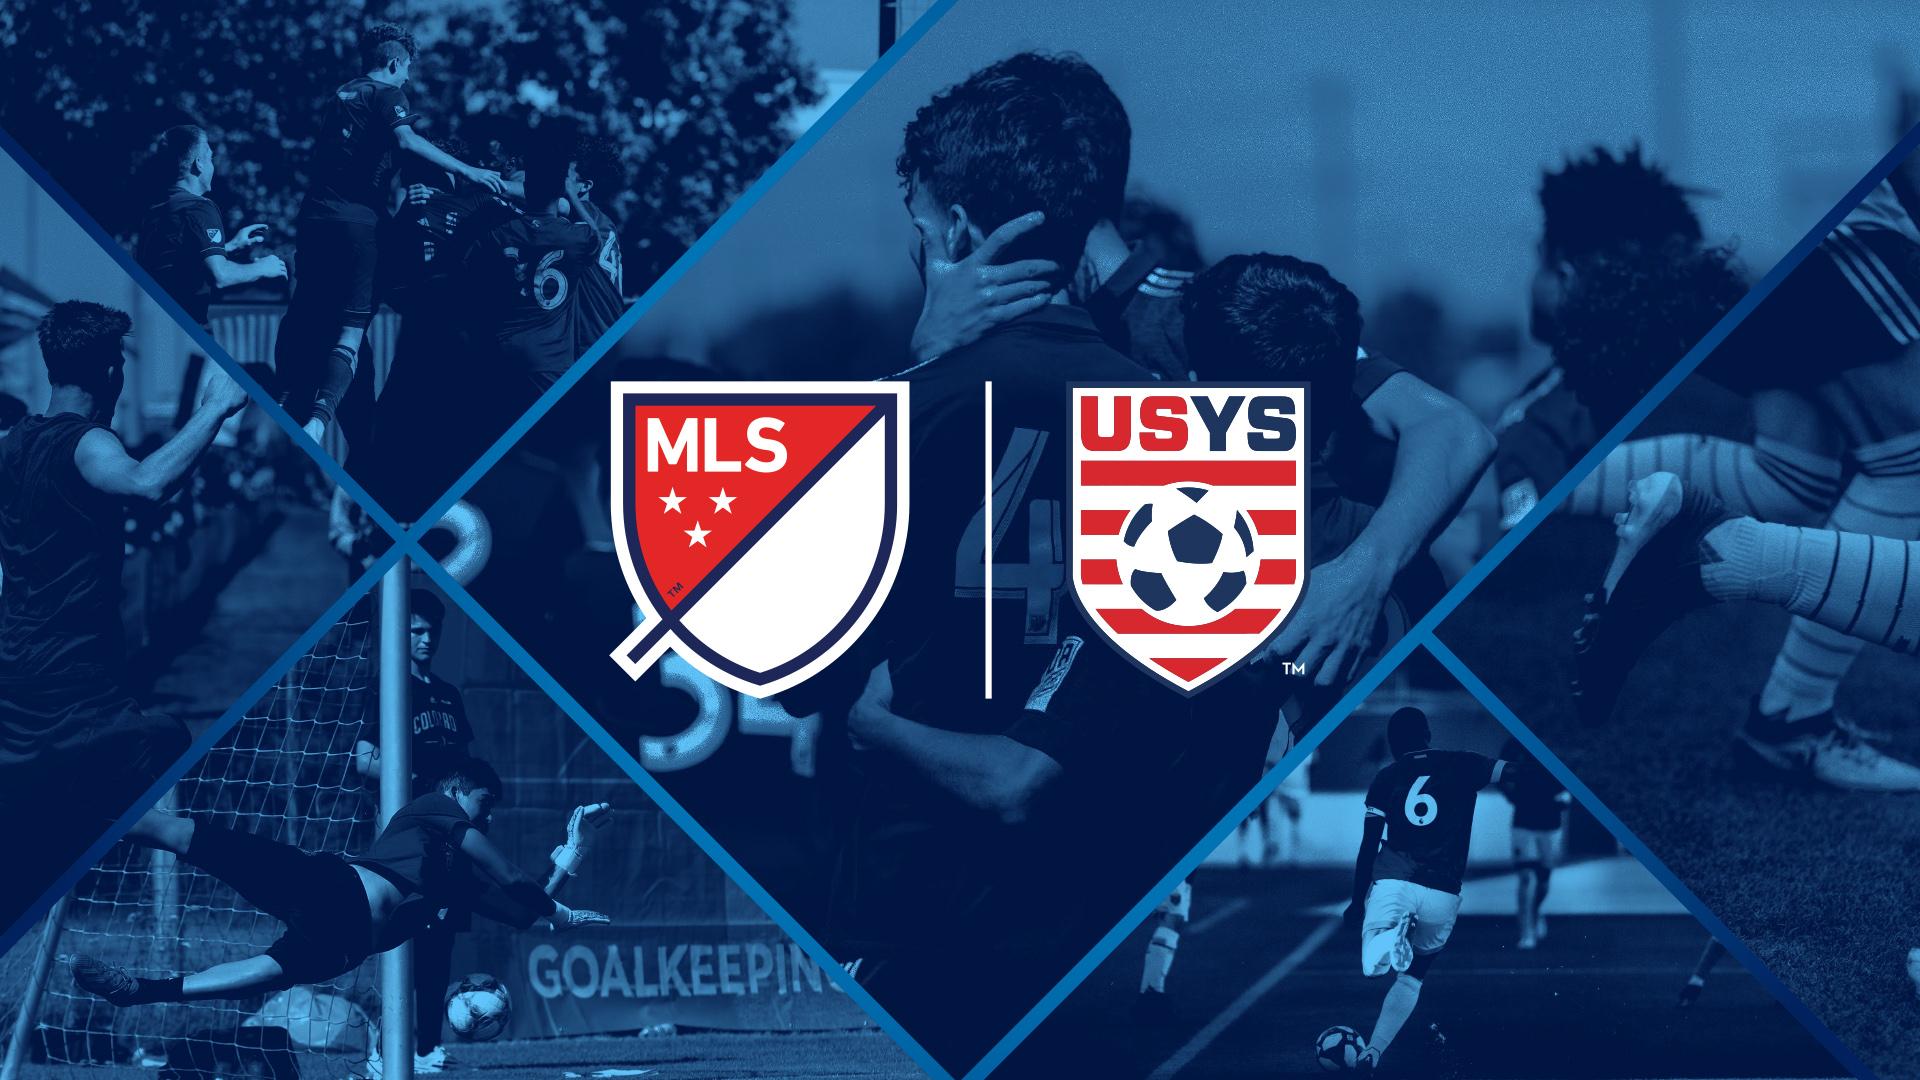 MLS_USYS_graphic